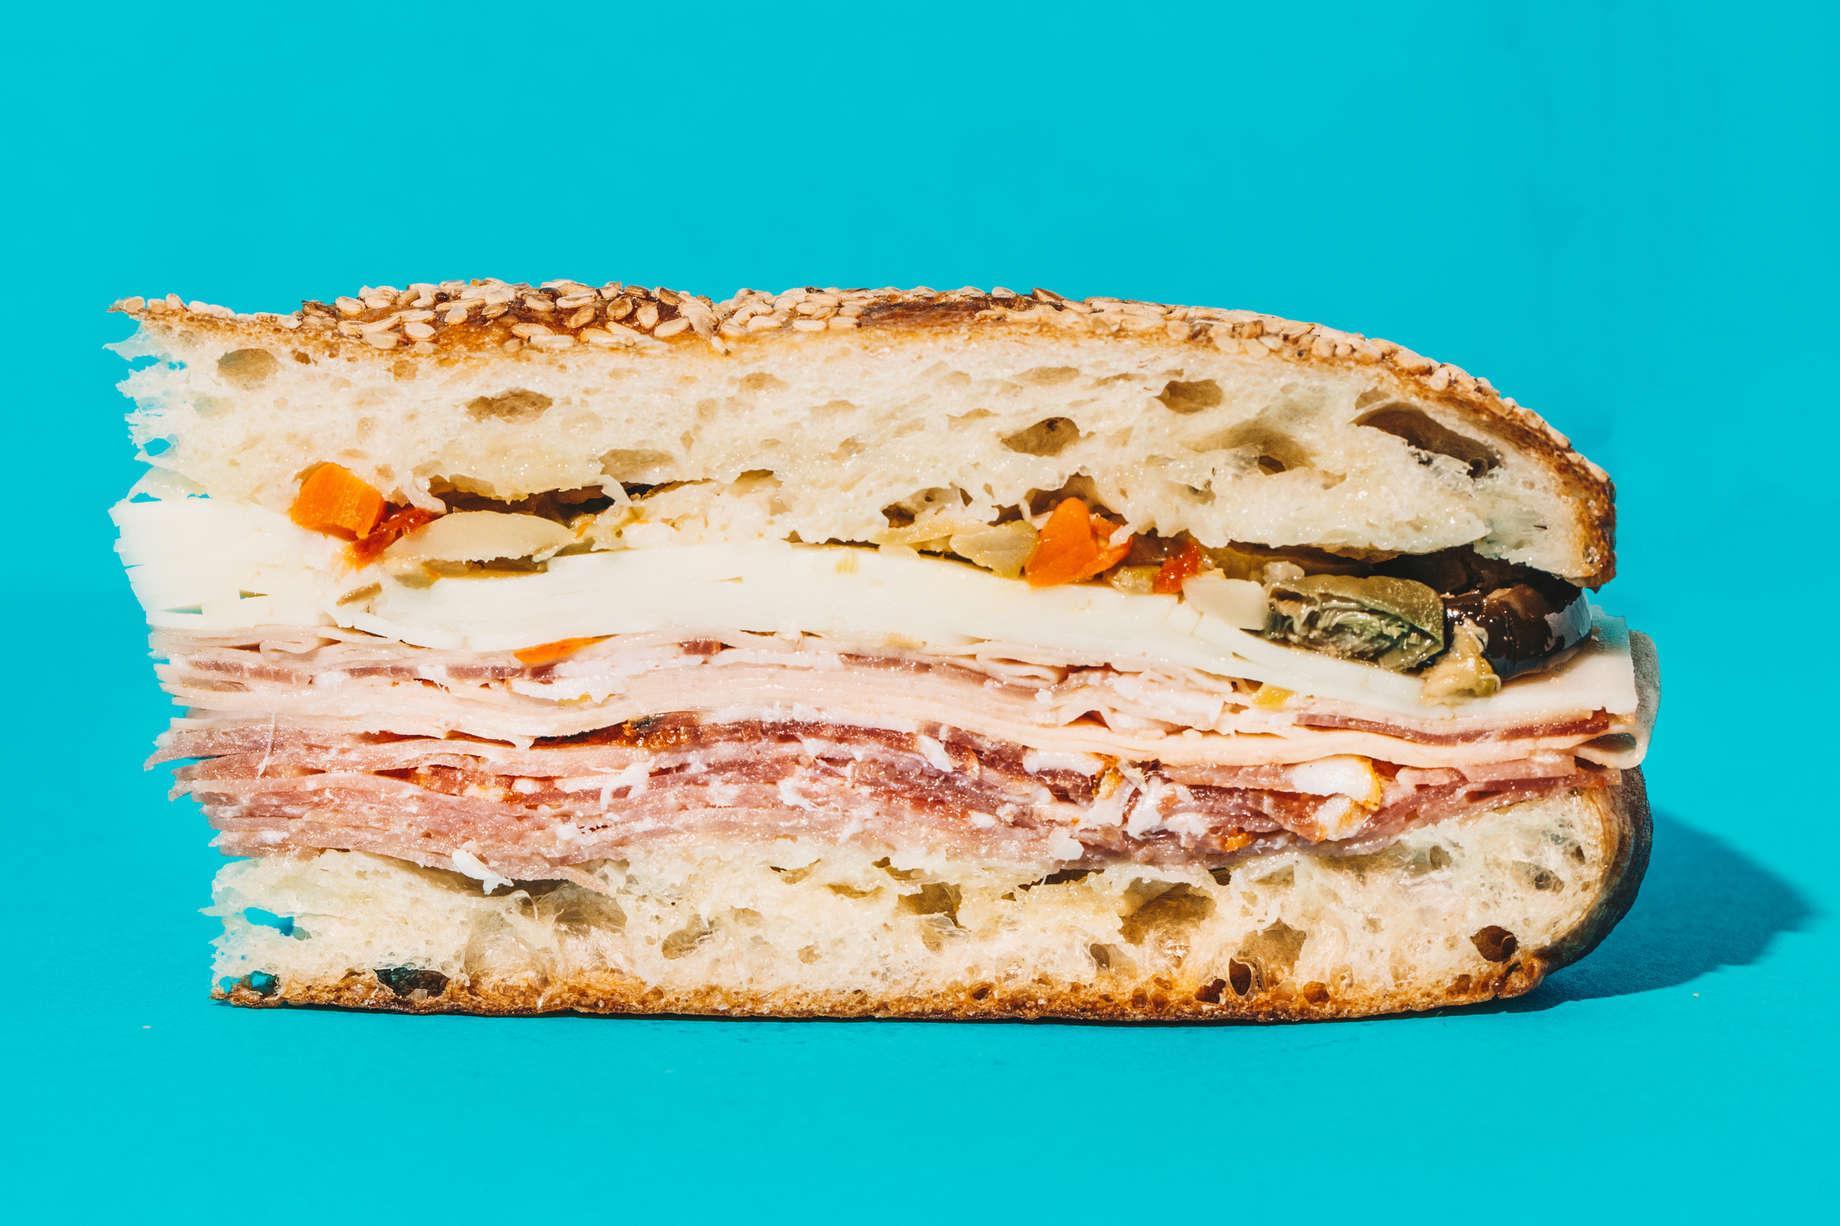 fdddfb23 Best Sandwiches Around the World: A Guide to 80 Types of Sandwiches -  Thrillist